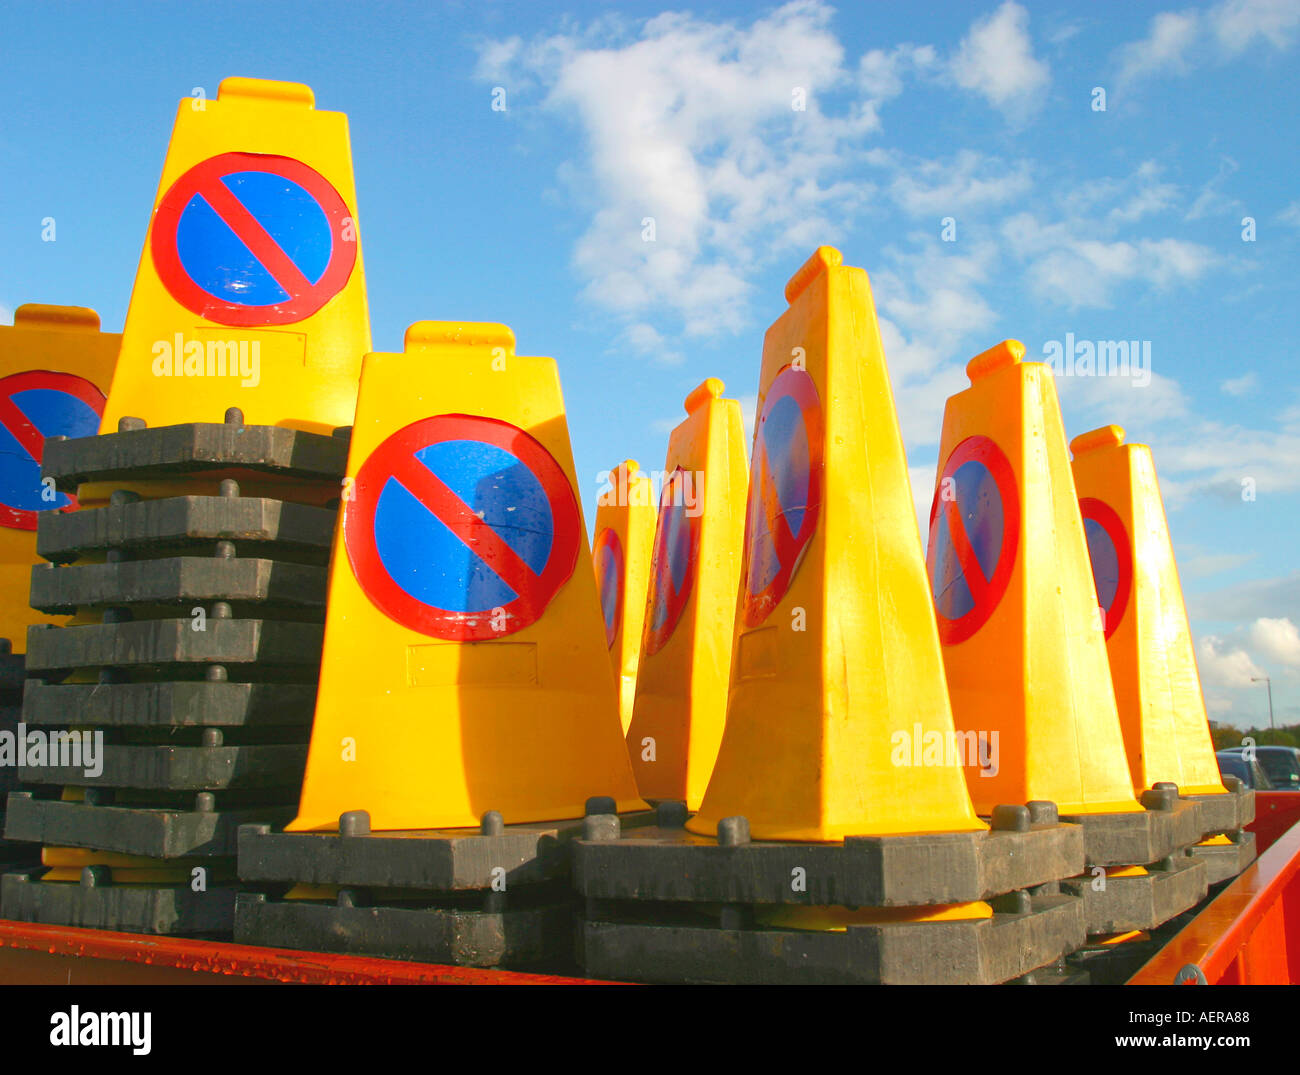 No waiting traffic cones - Stock Image